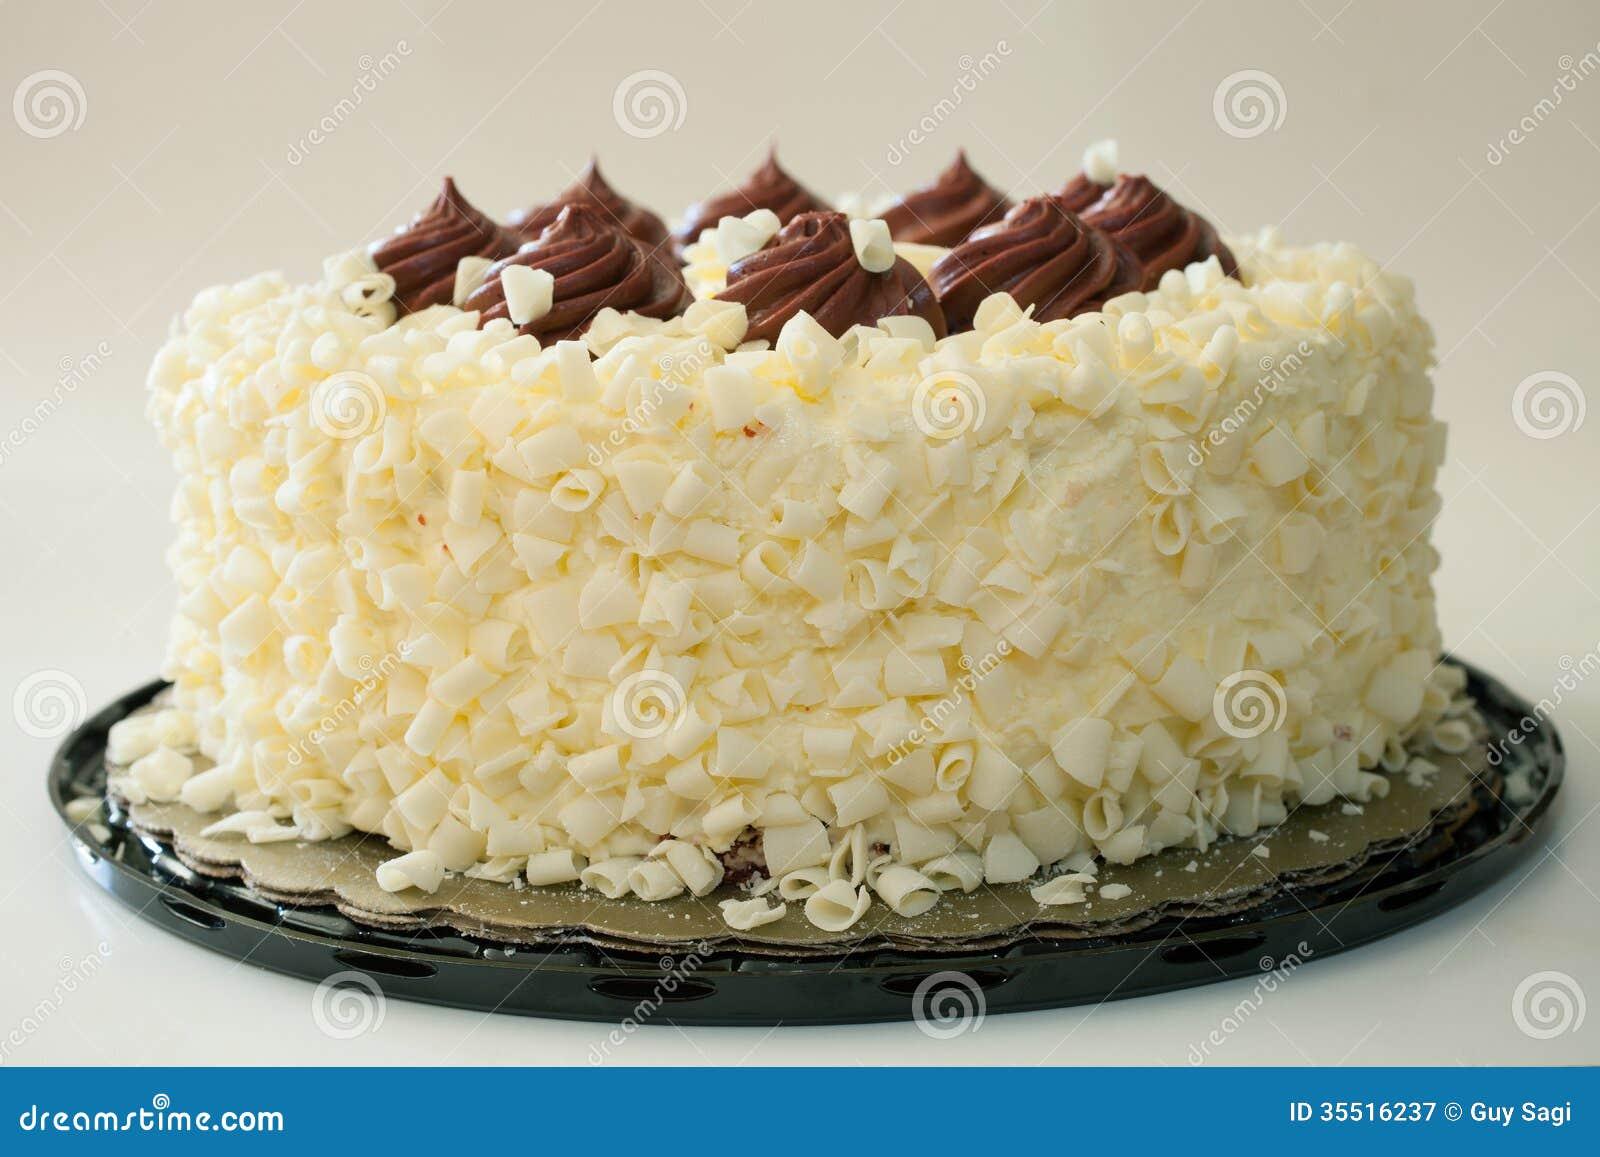 Lemon Cake With Vanilla Frosting